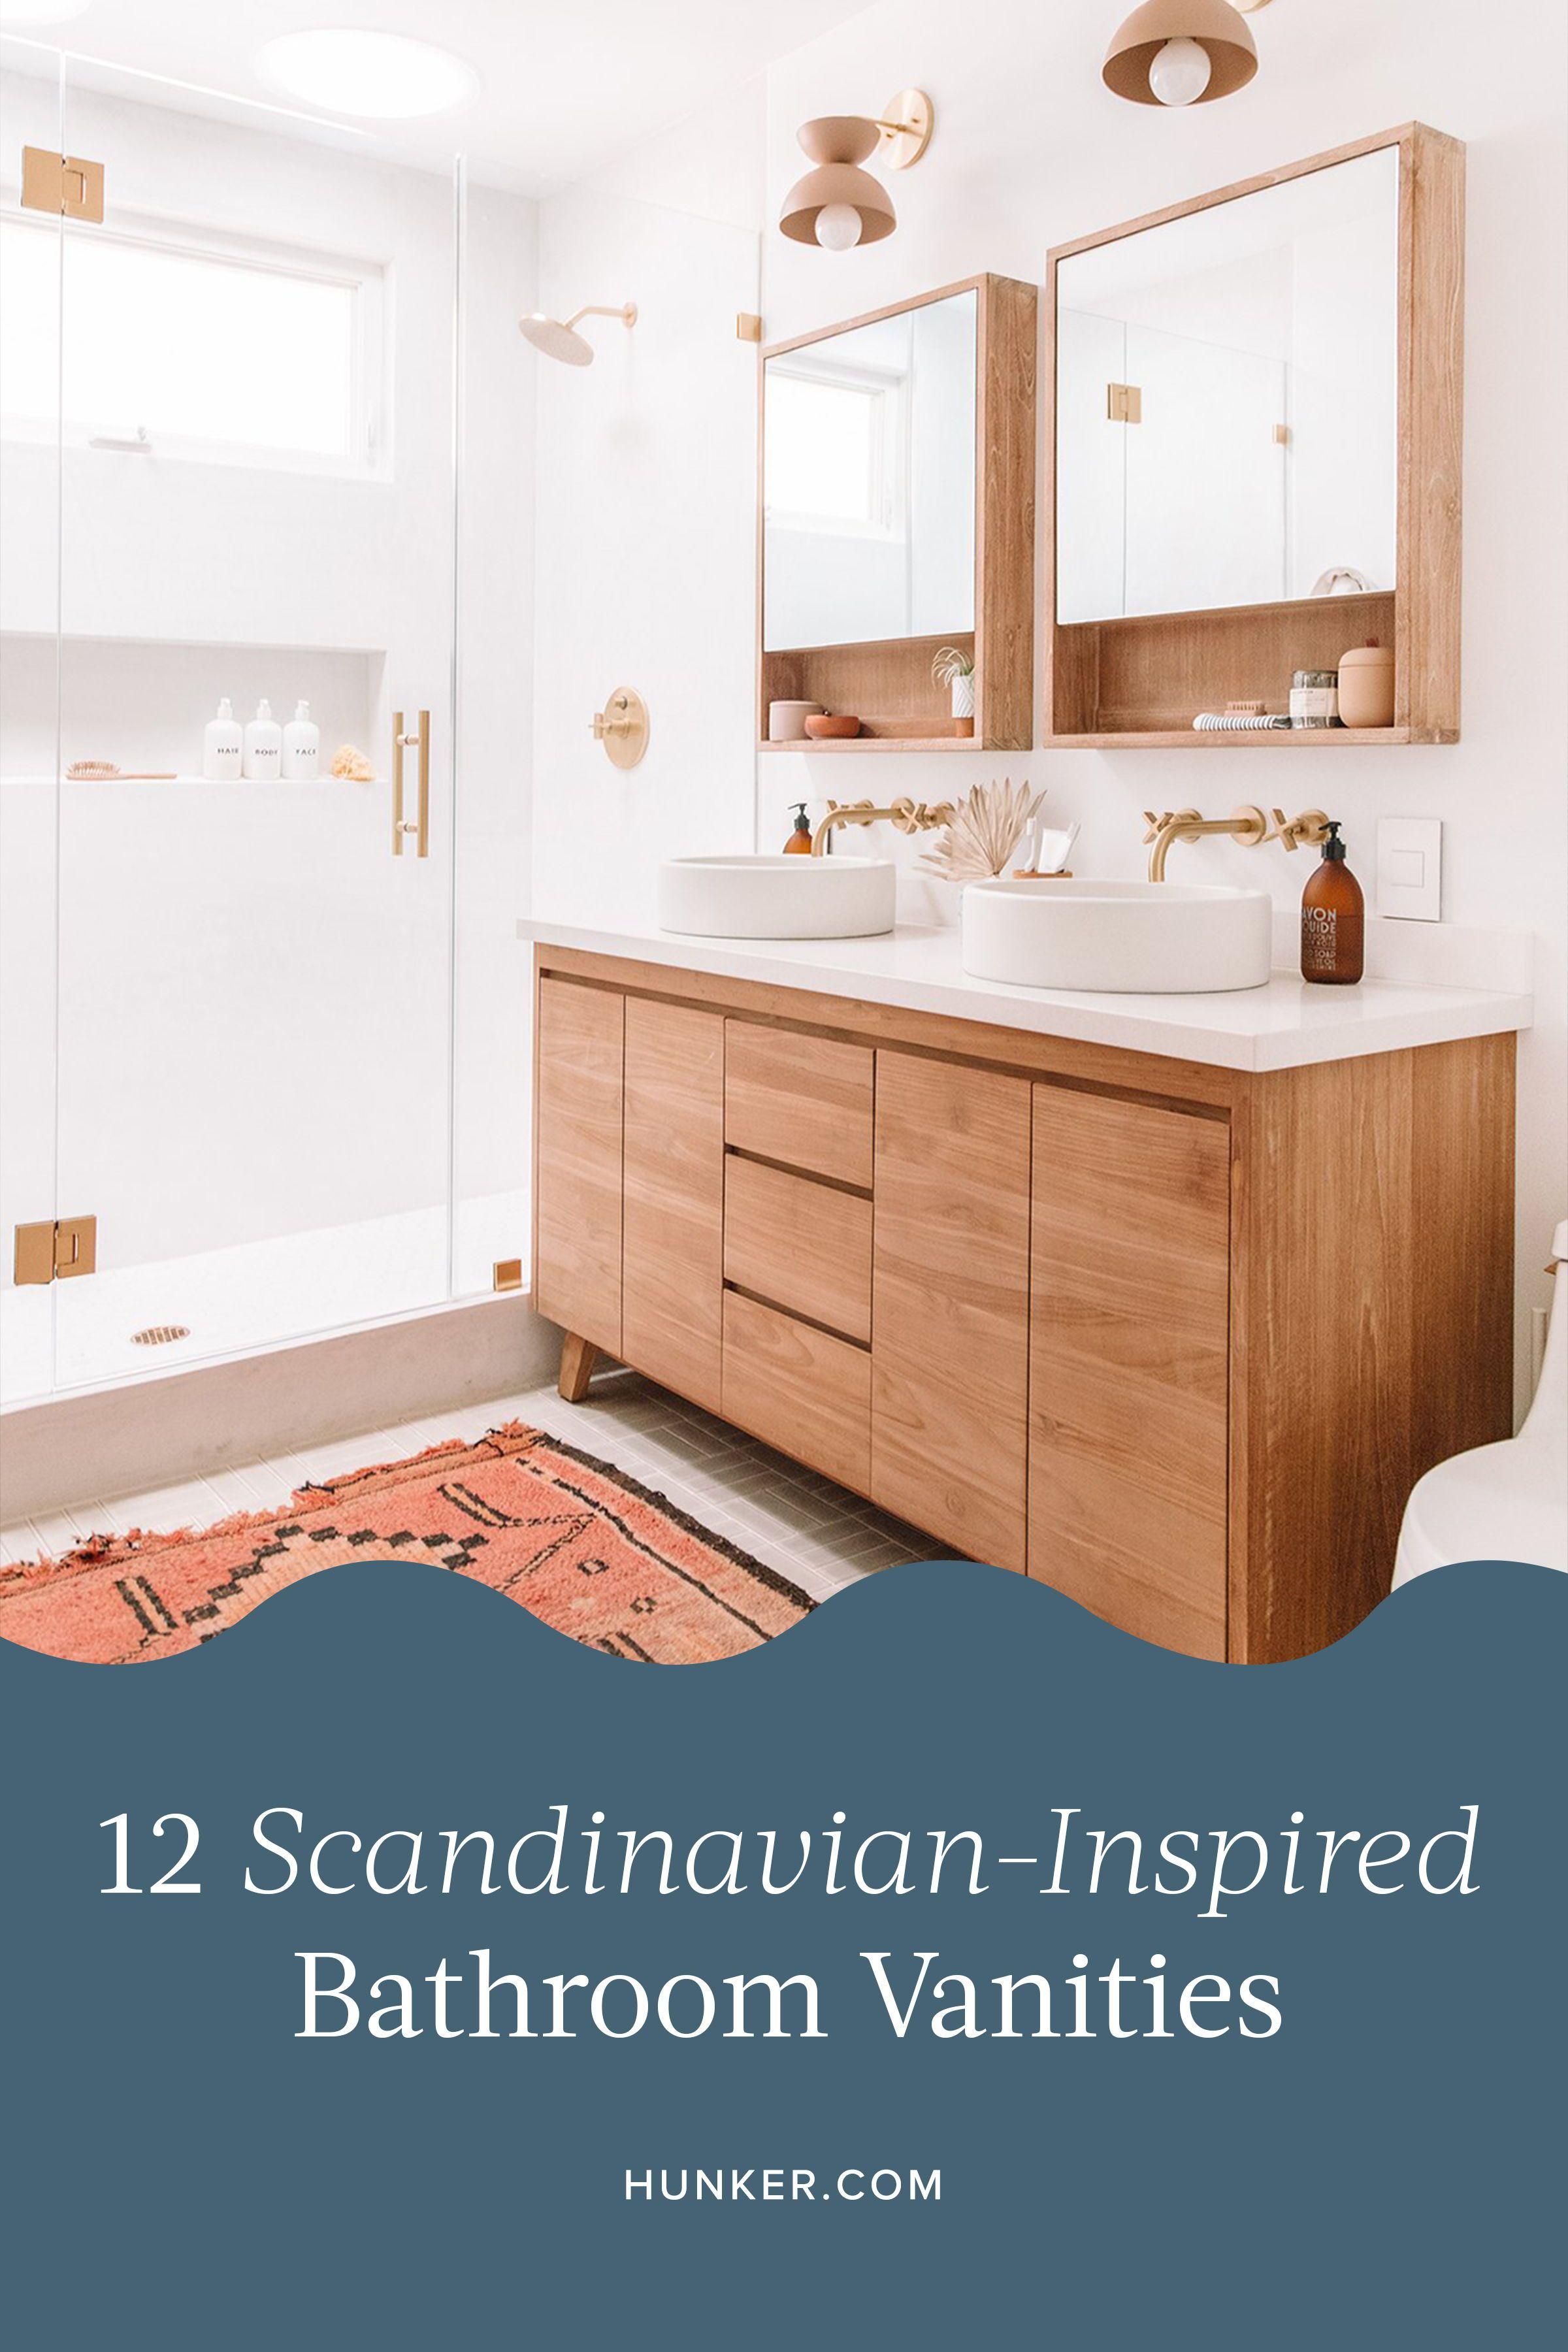 12 Scandinavian Inspired Bathroom Vanities That Prove Less Is More Hunker Bathroom Vanity Bathroom Vanity Designs Scandinavian Bathroom